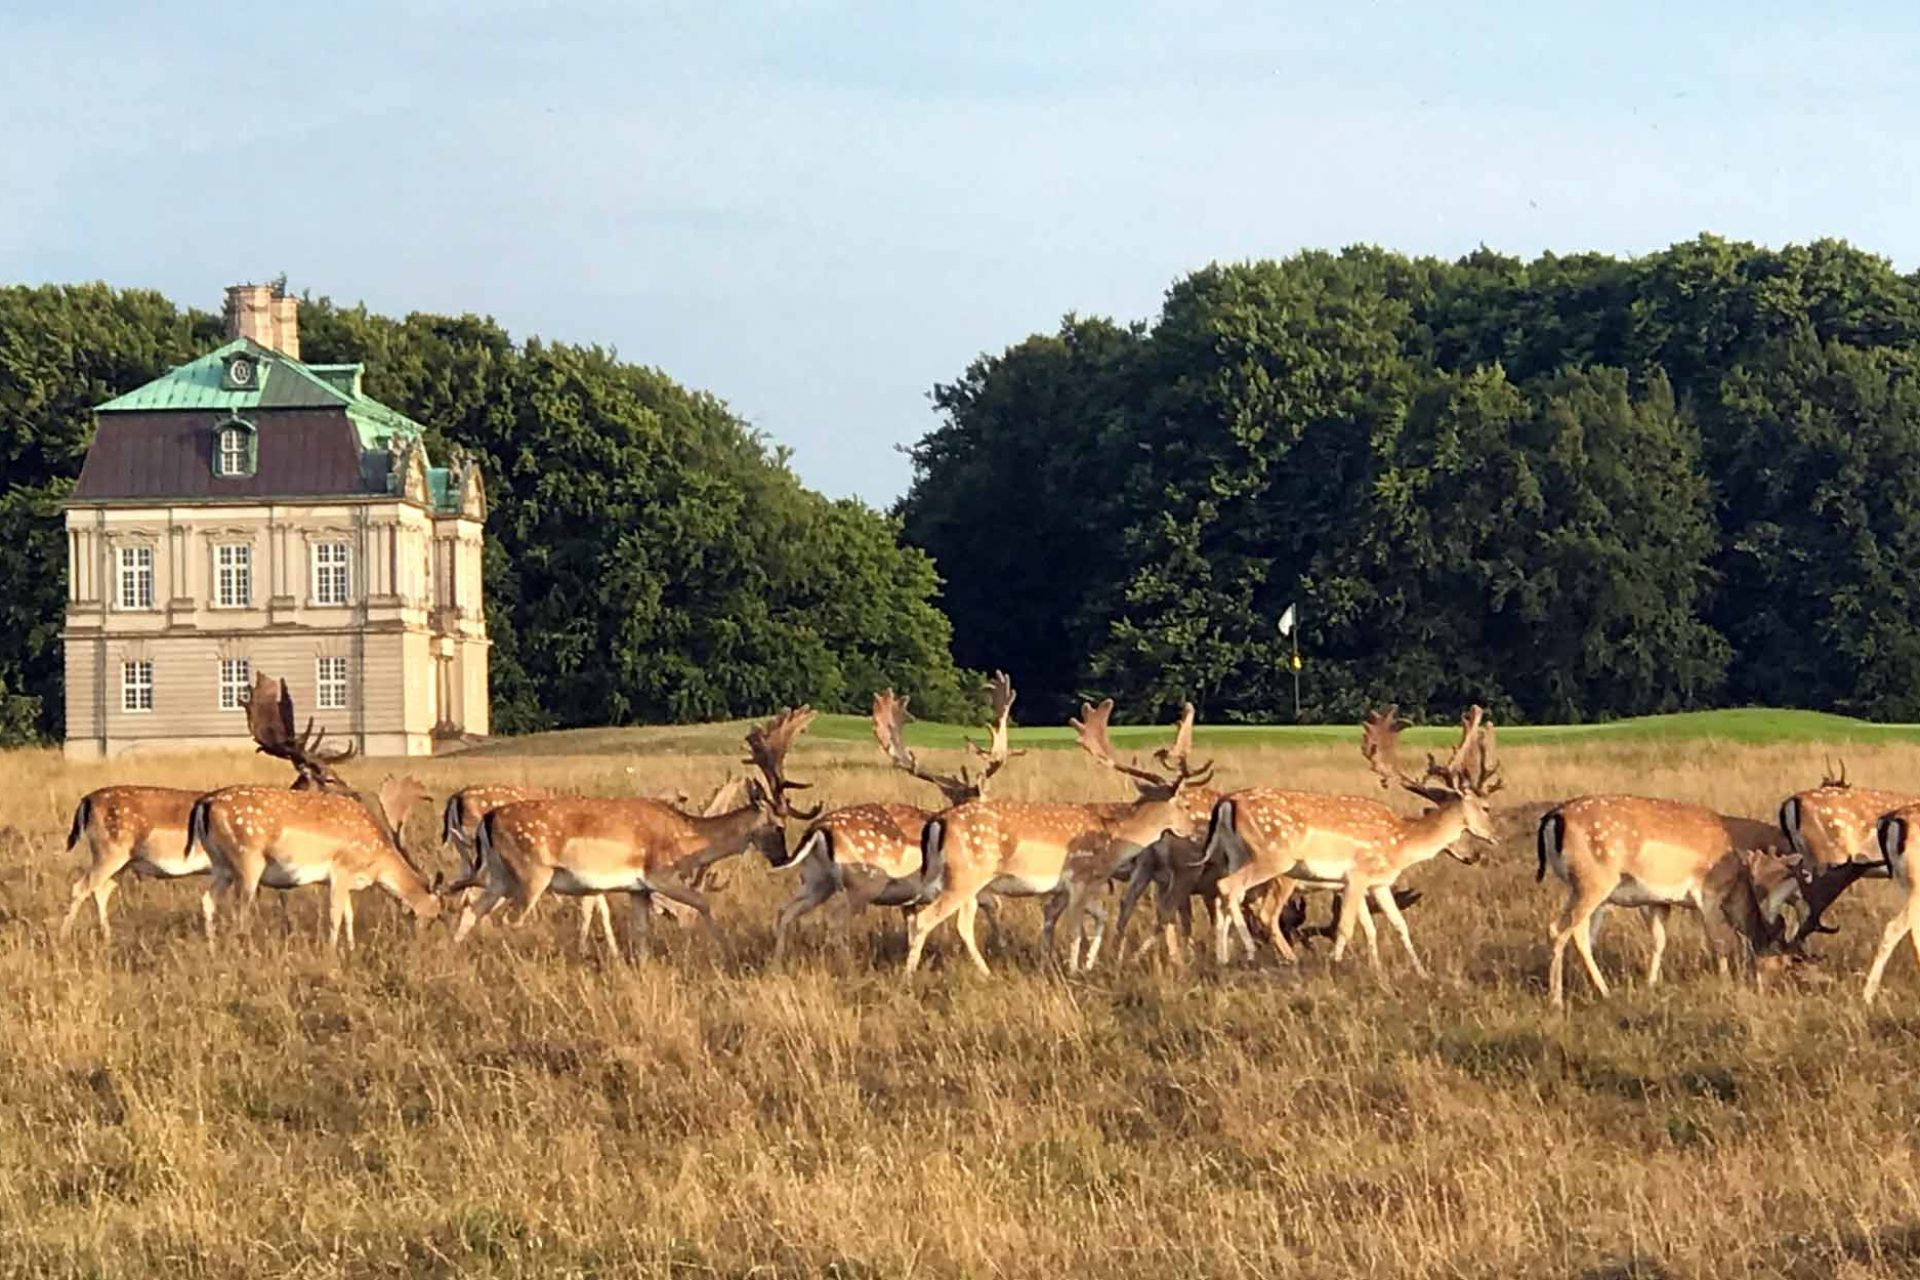 koebenhavns-golf-klub-dyrehaven